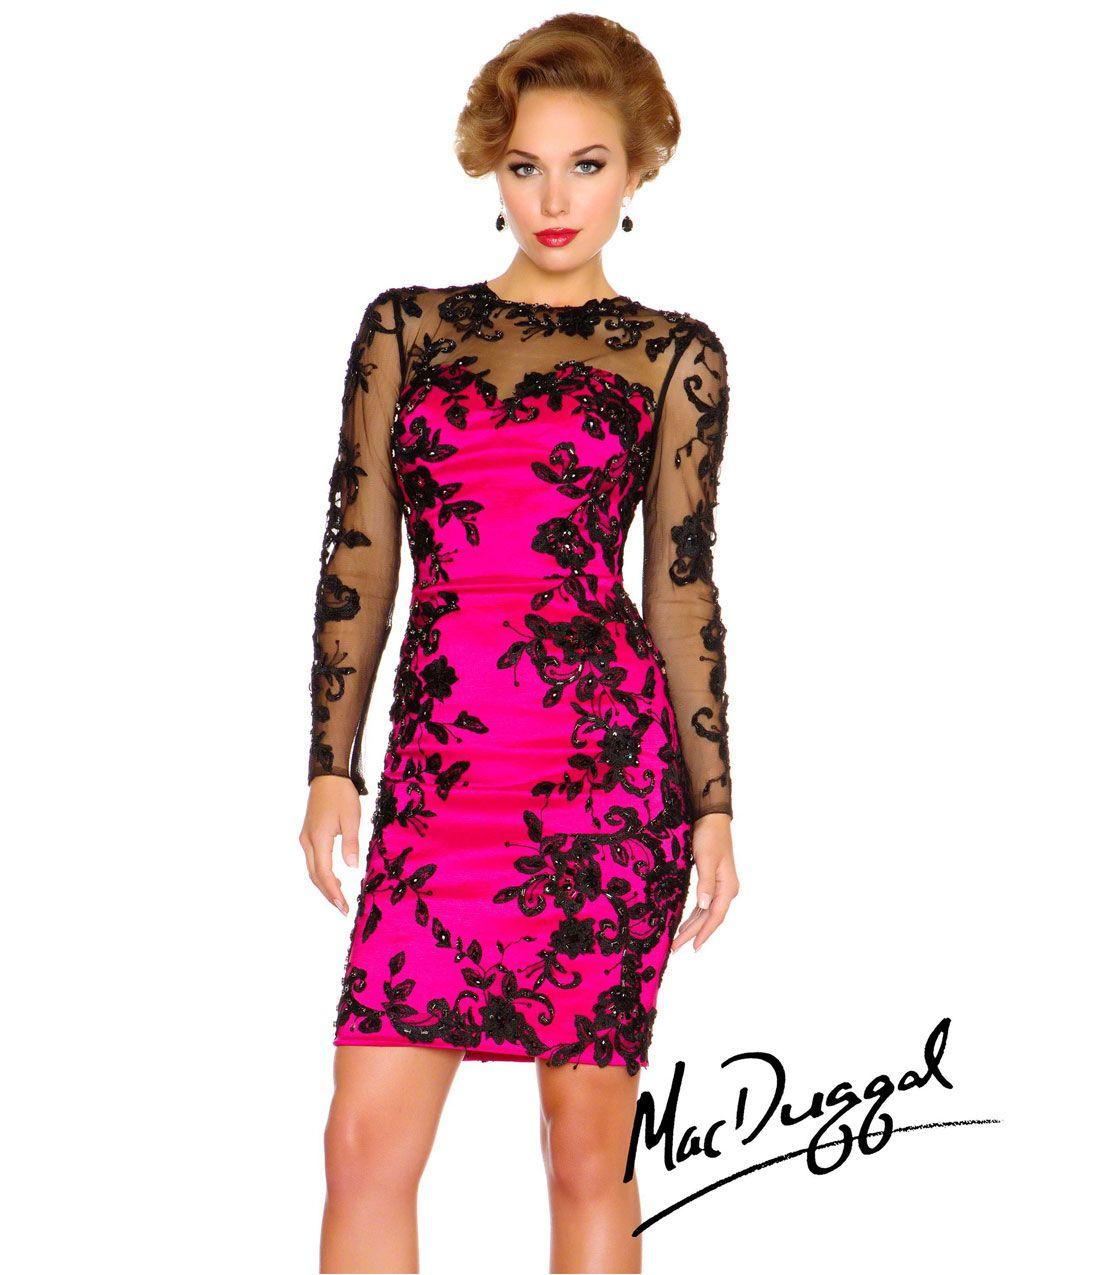 Mac duggal fuchsia taffeta u black lace prom dress unique